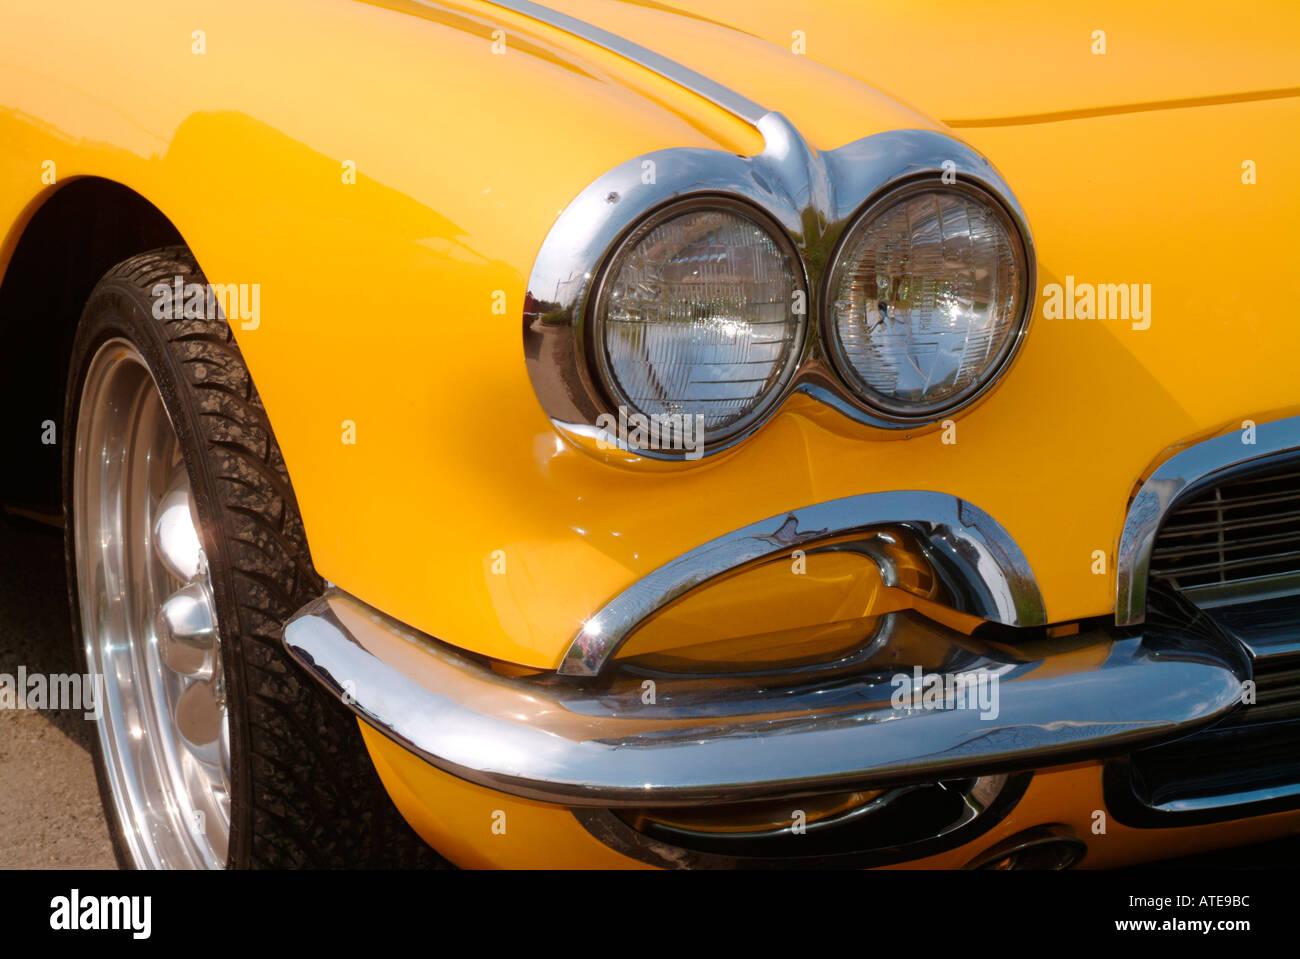 detail of an antique 1960 Corvette sportscar - Stock Image